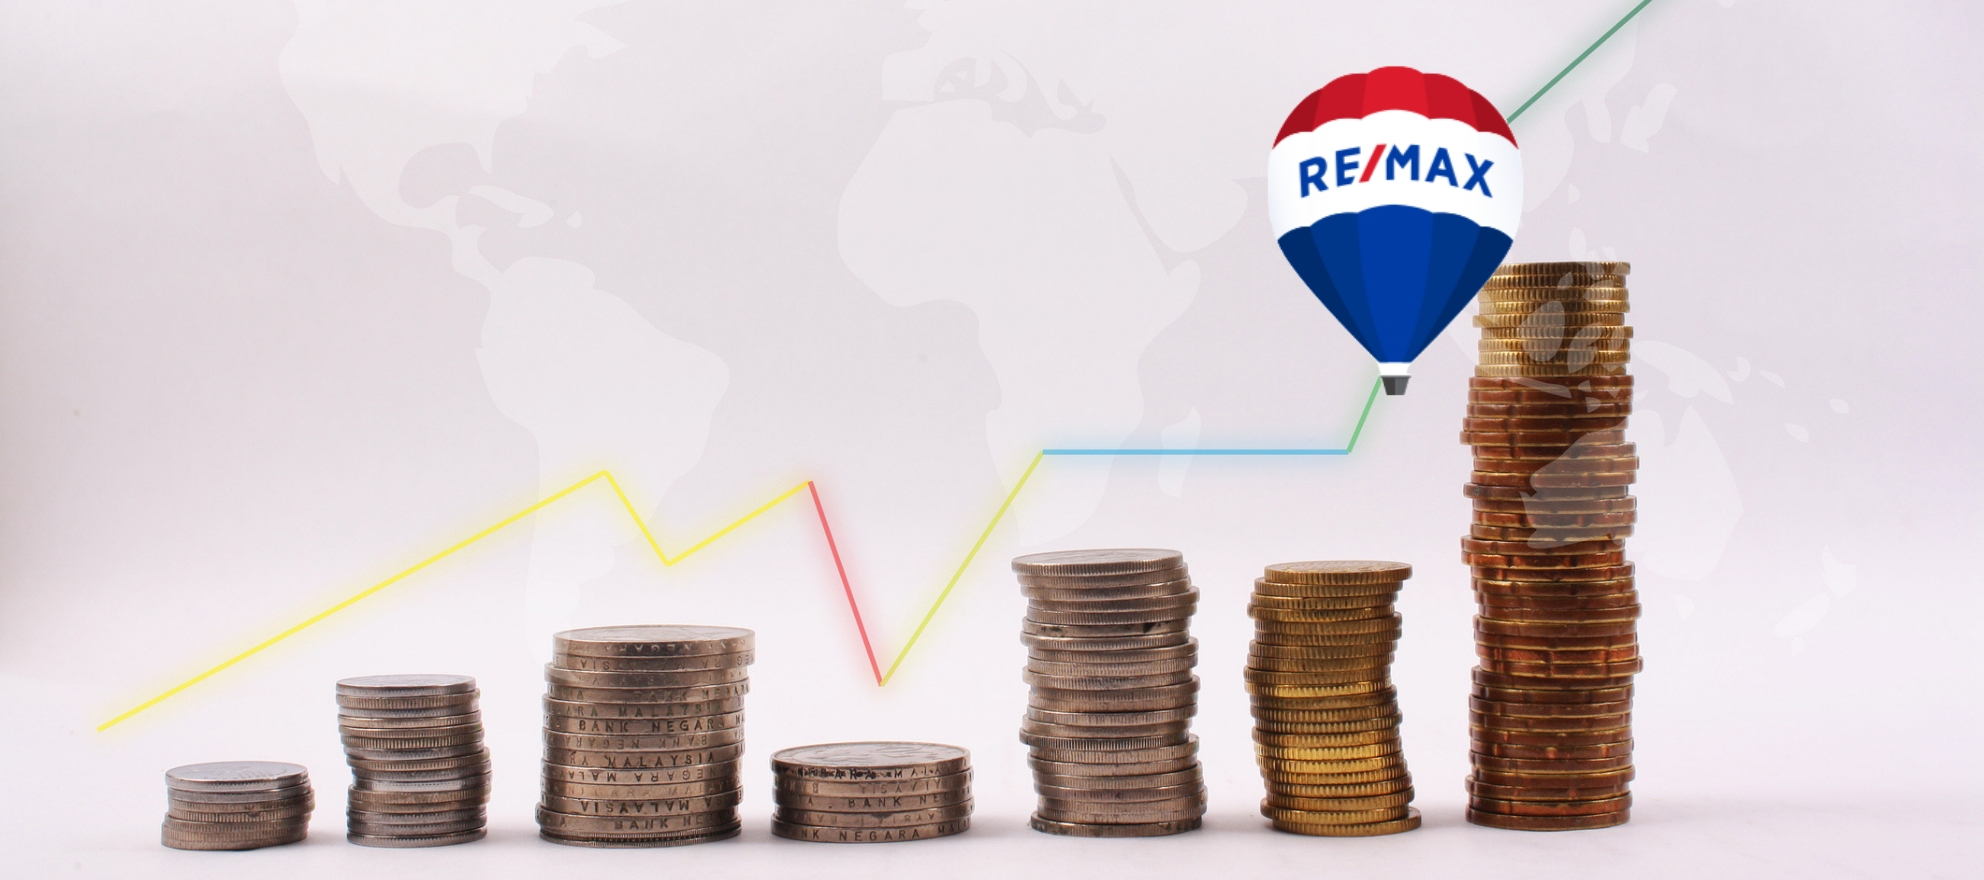 RE/MAX reports $50.8M in revenue for 4th quarter, beating estimates